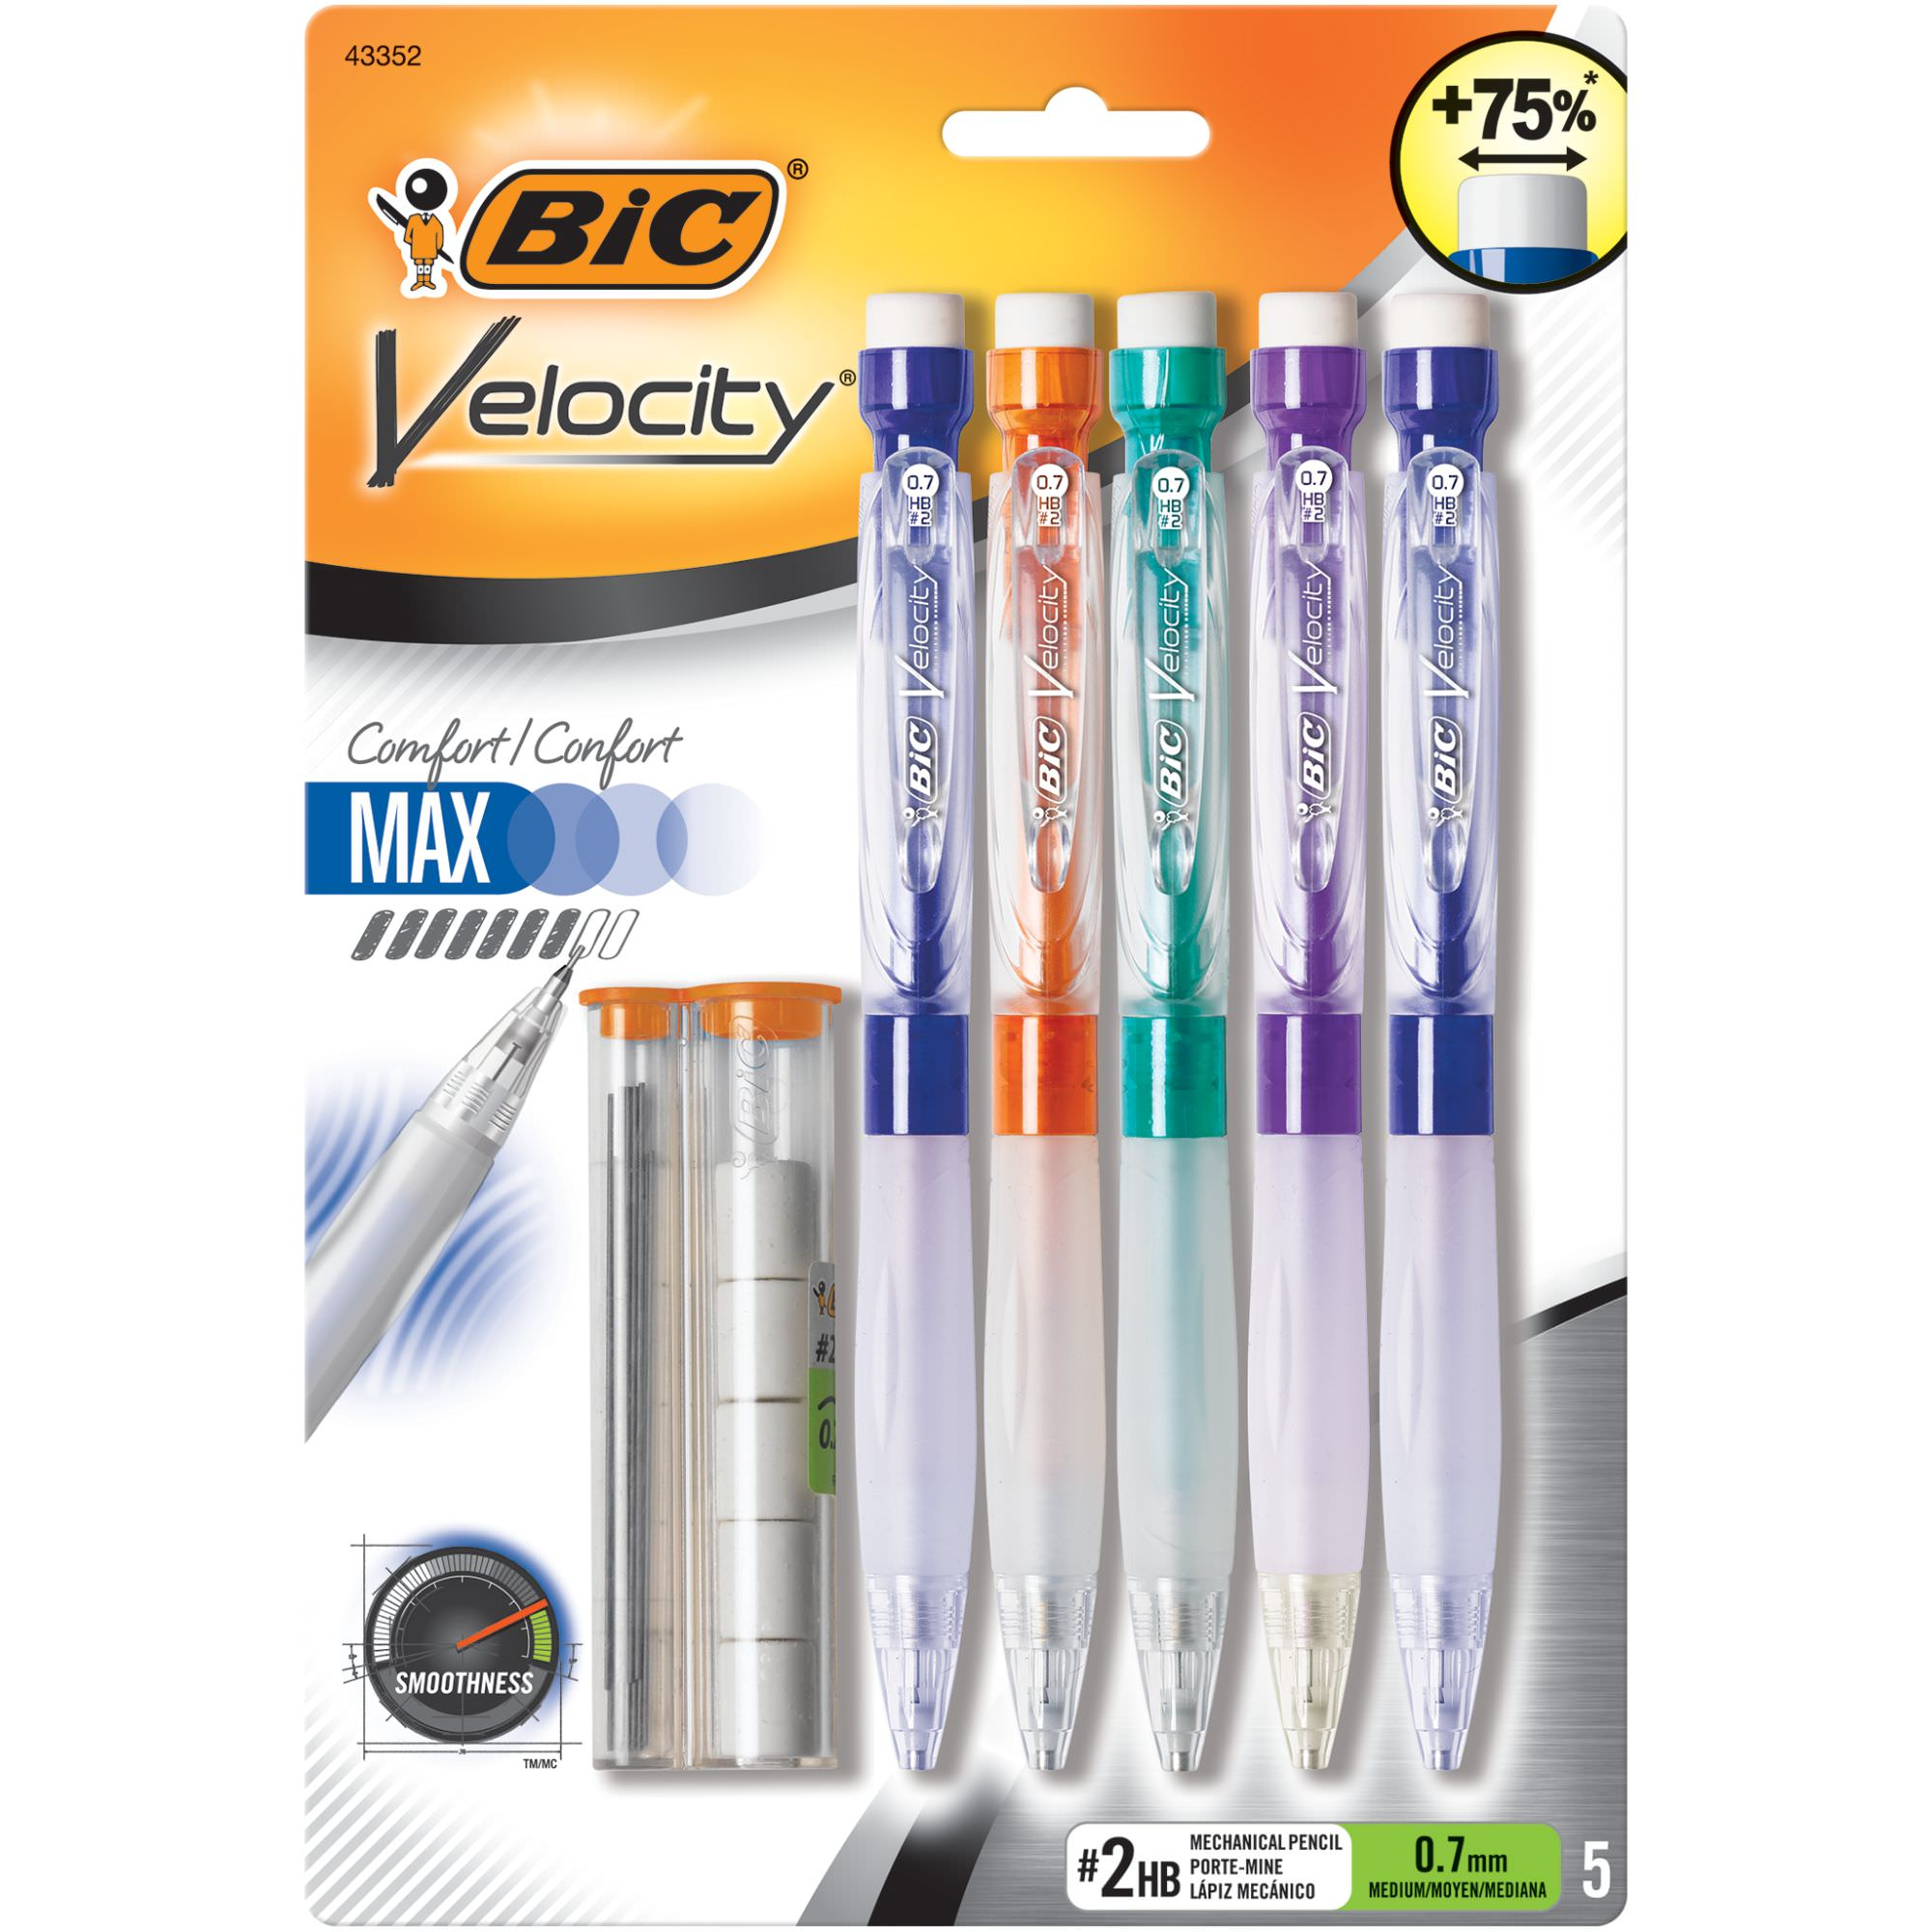 BIC Velocity Max Mechanical Pencil, Medium Point (0.7mm), 5 Count